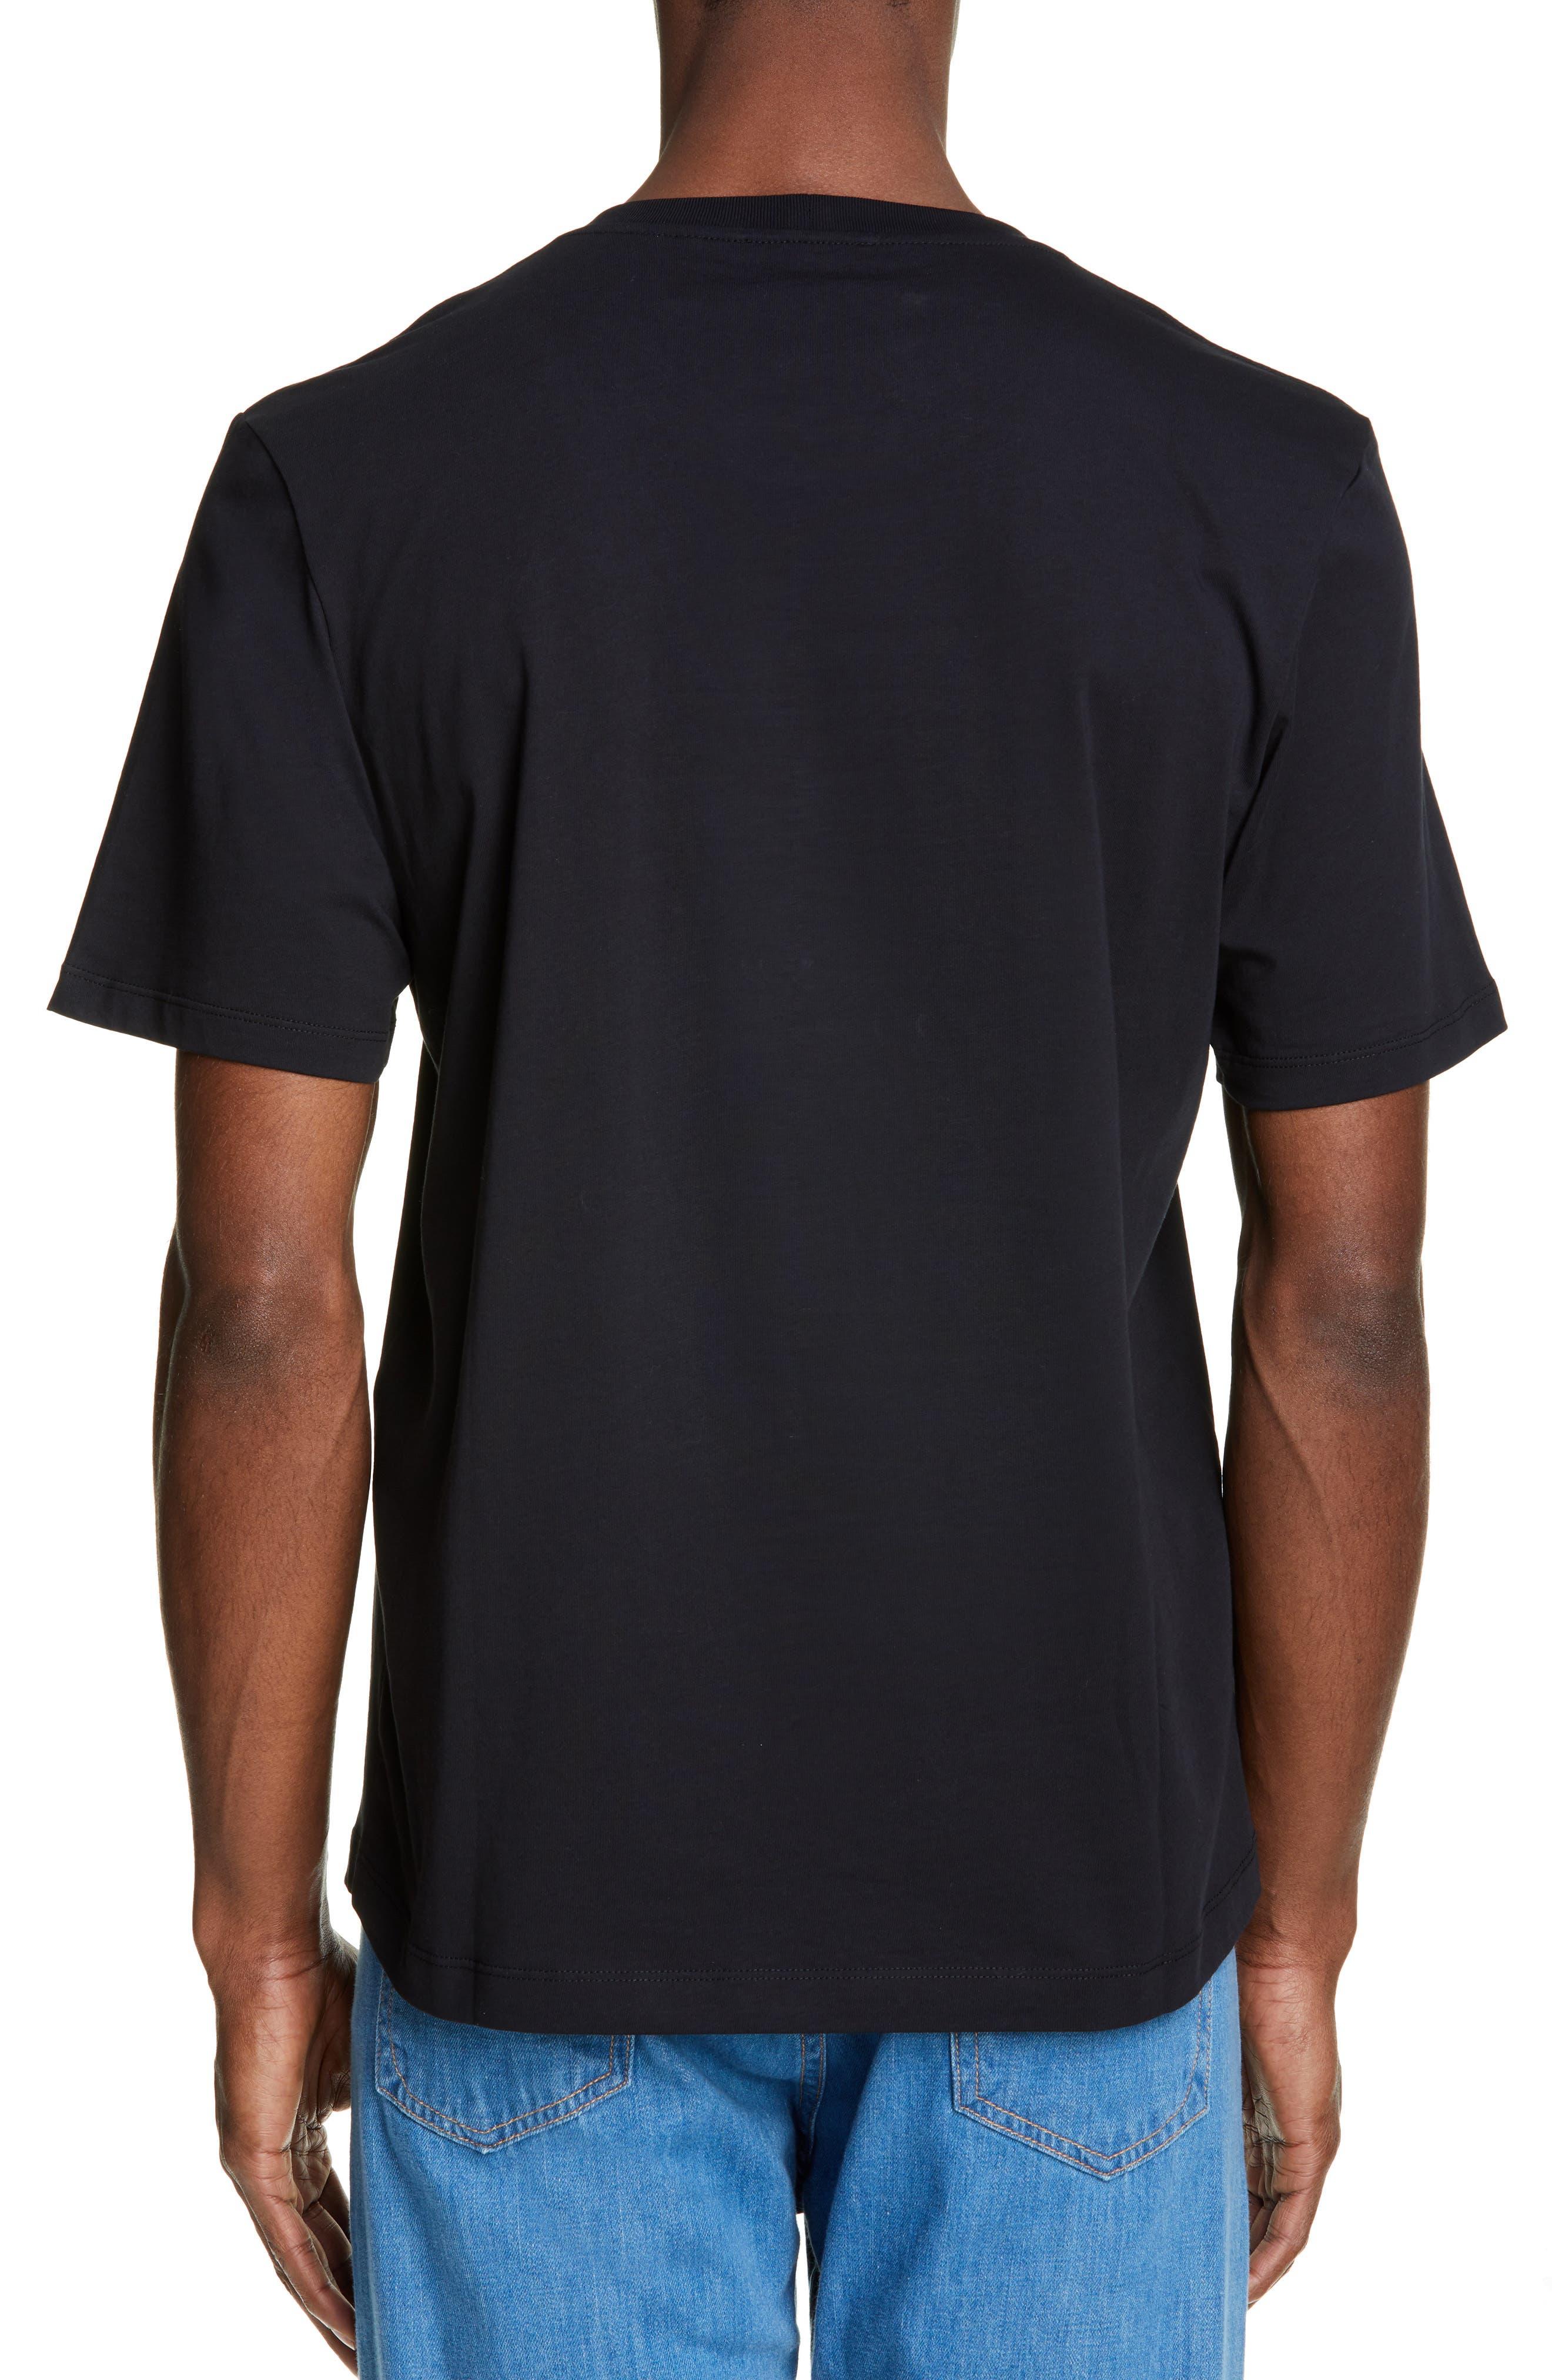 HELMUT LANG, Stacked Logo T-Shirt, Alternate thumbnail 2, color, BLACK BASALT